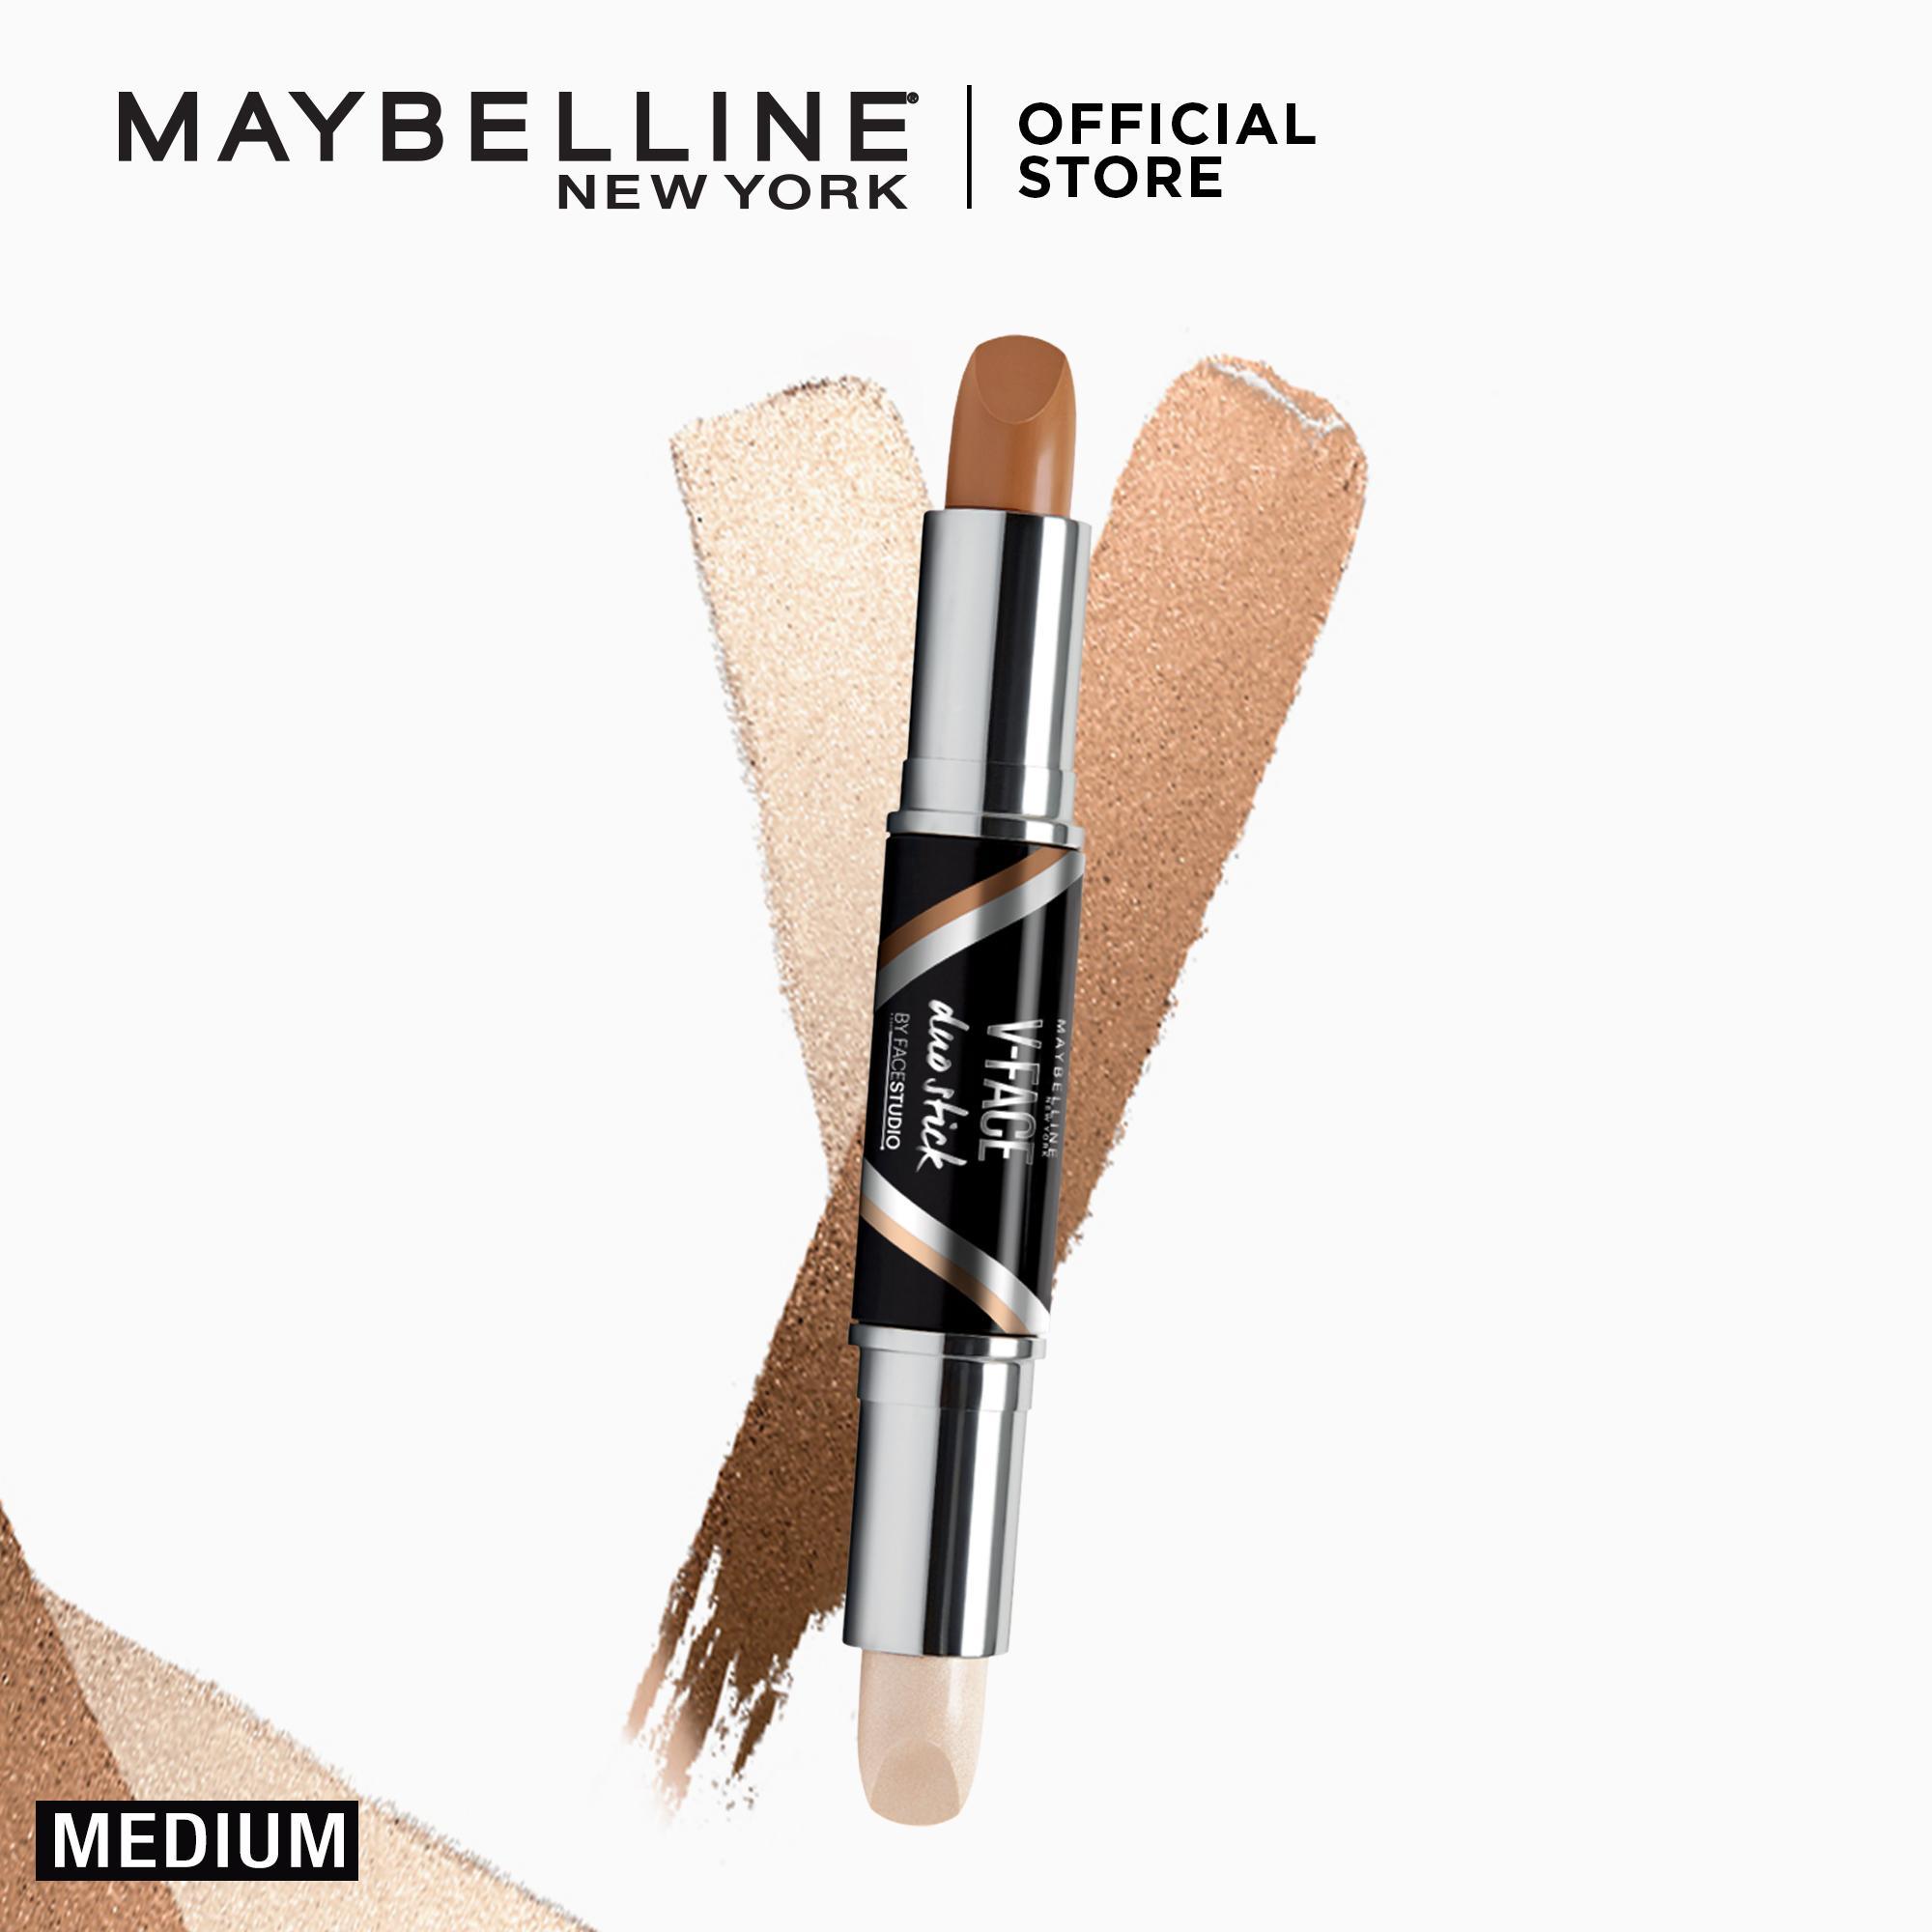 Shimmer Highlights Brands High Lighter Makeup On Sale Prices Set Maybelline V Face Duo Powder Contouring Stick Medium